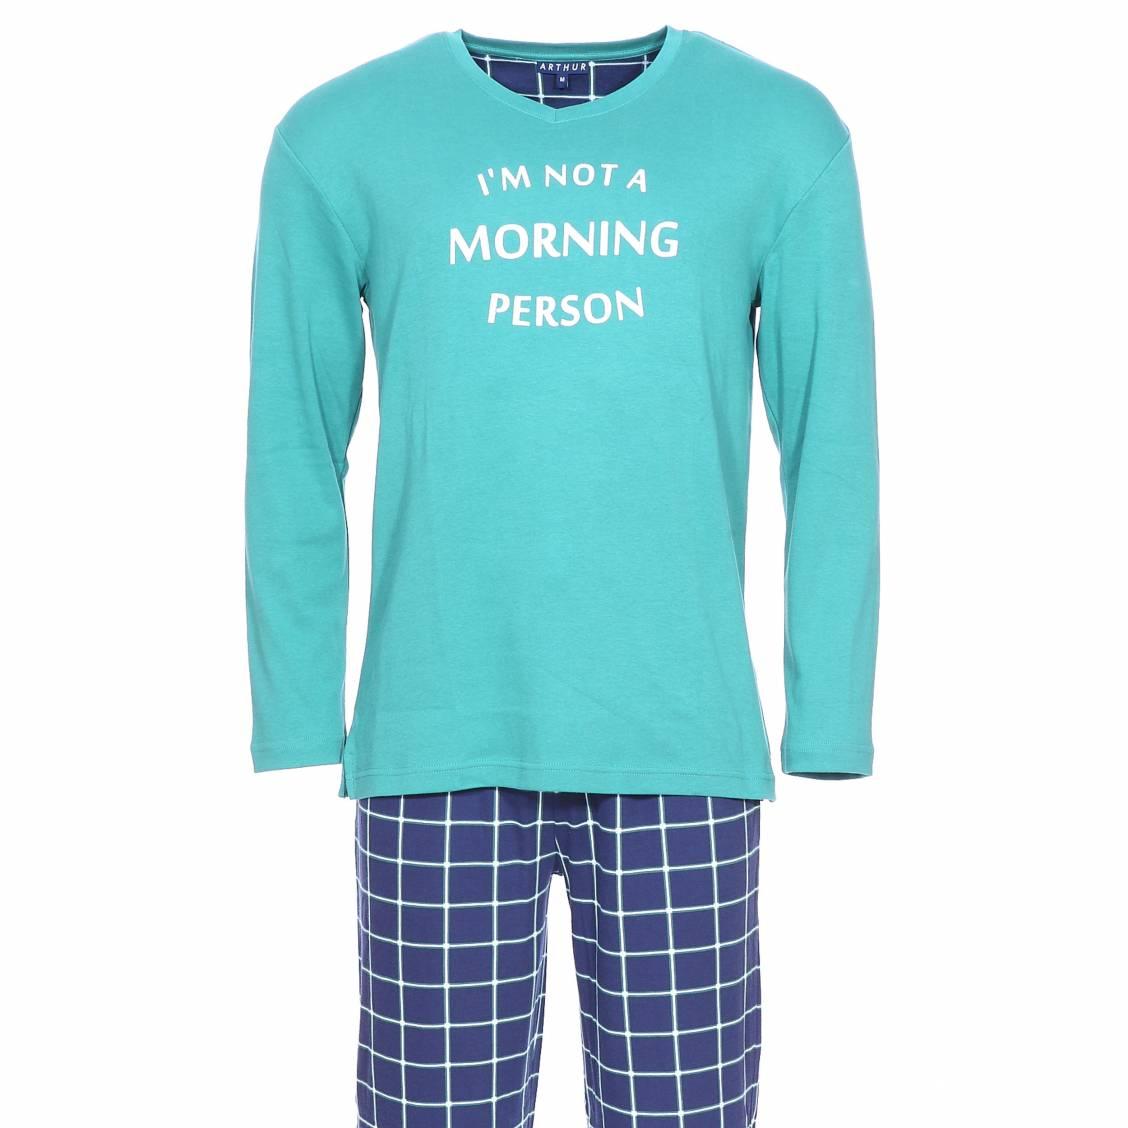 Pyjama Homme Chaud Of Pyjama Chaud Arthur Oregon Tee Shirt Manches Longues